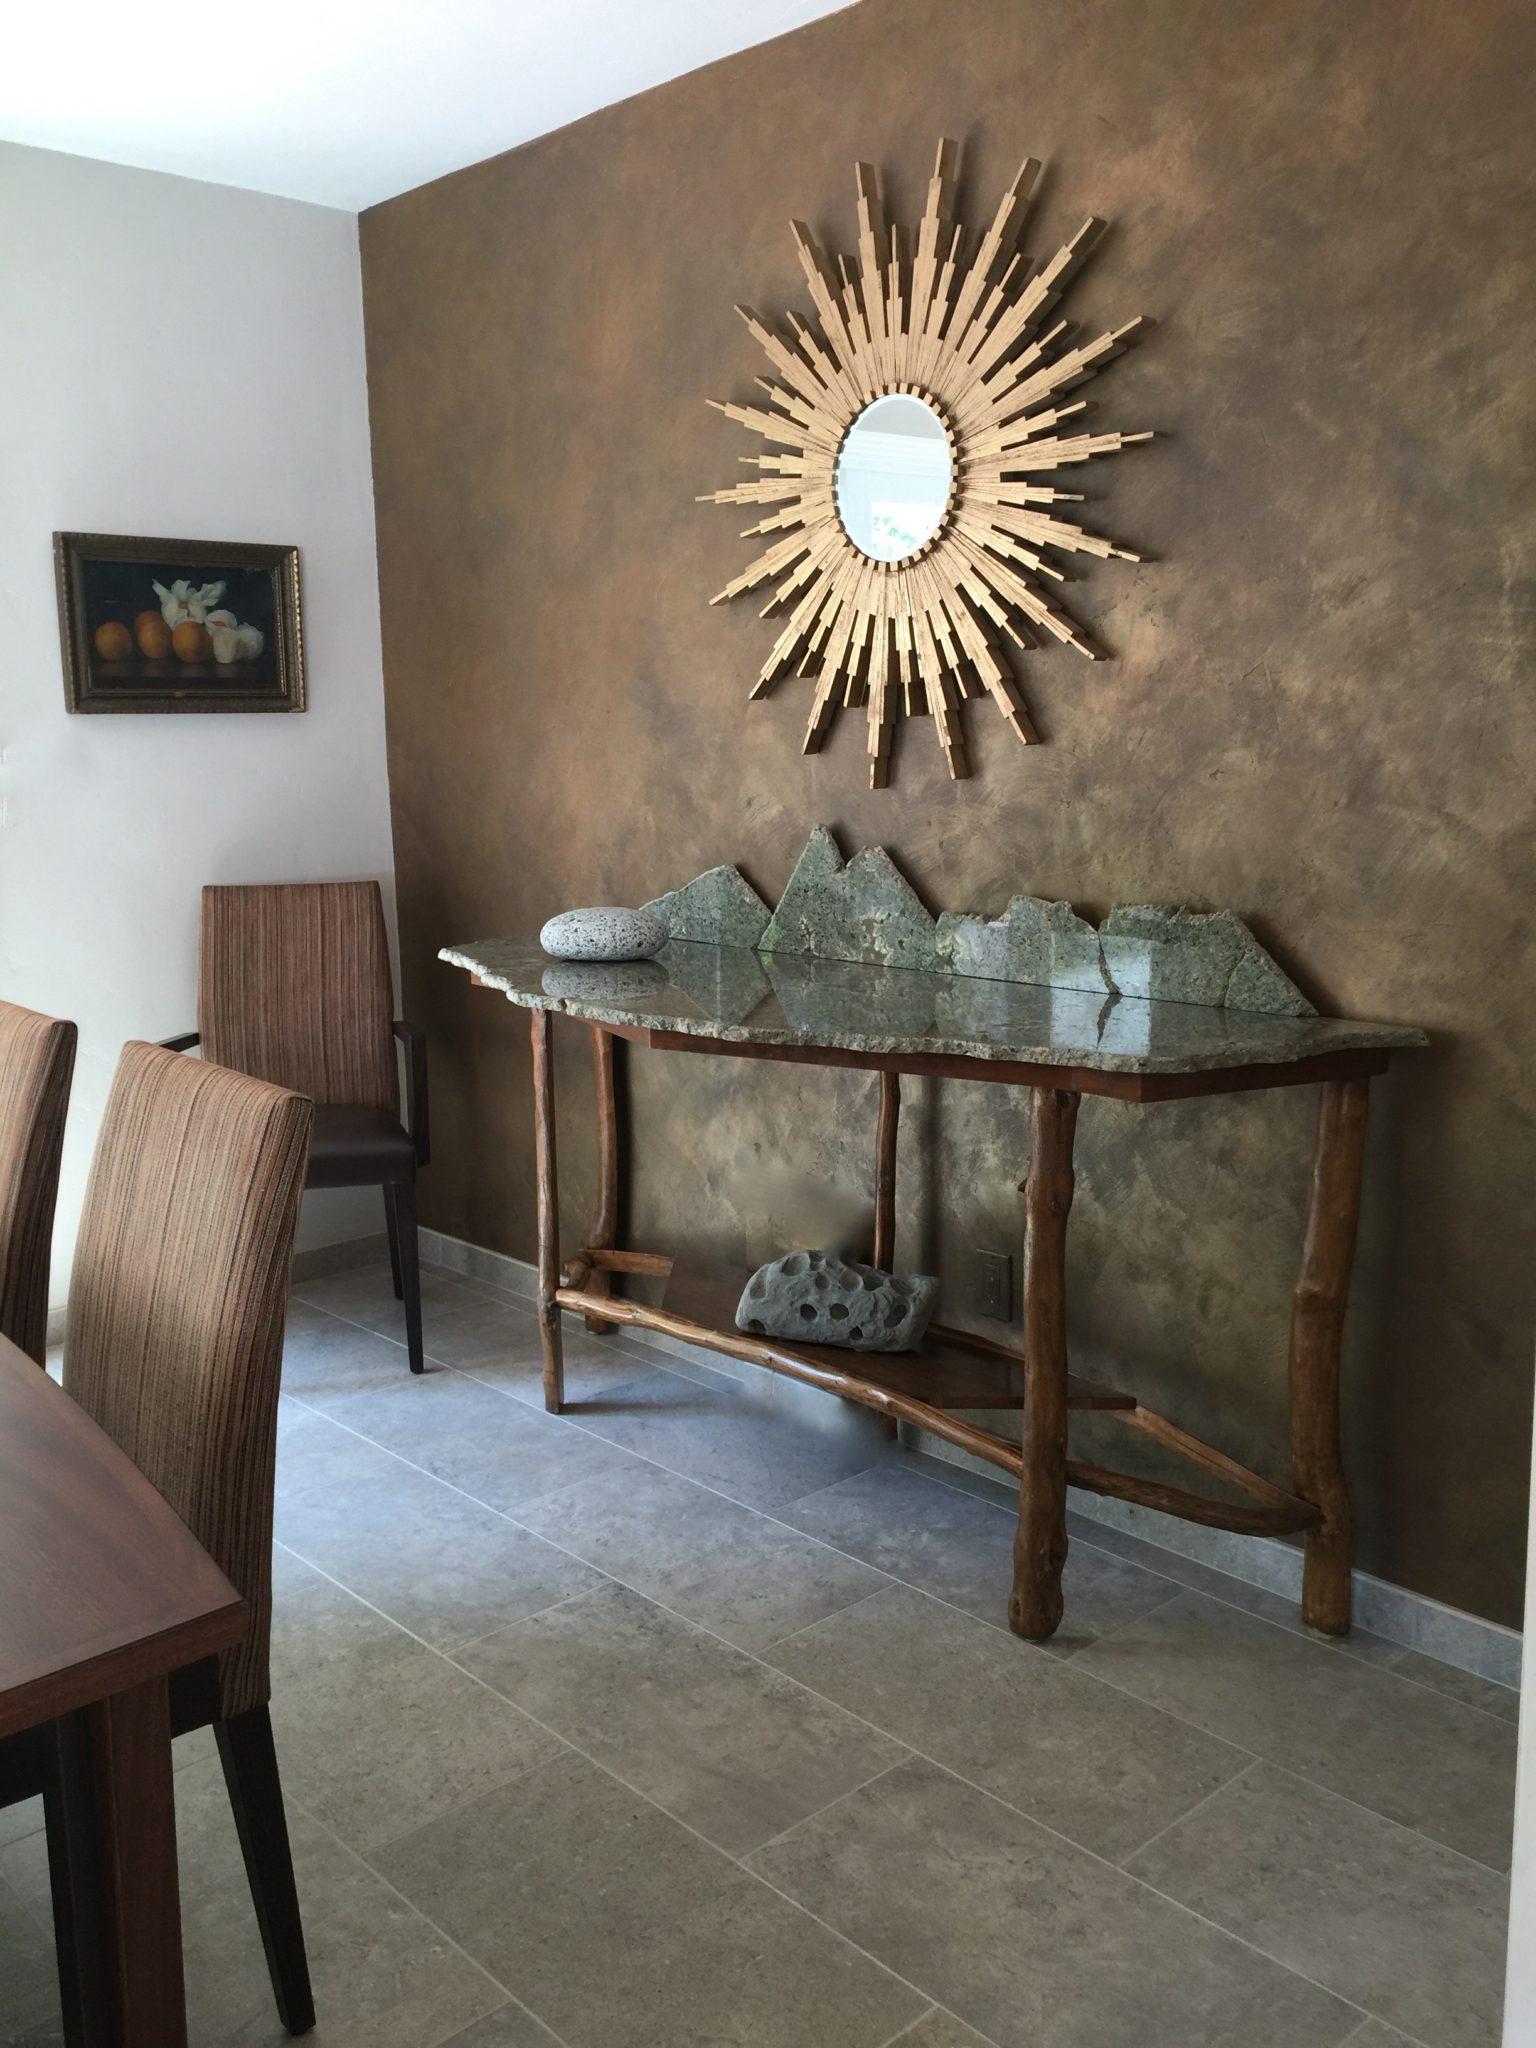 Furniture and objets dart